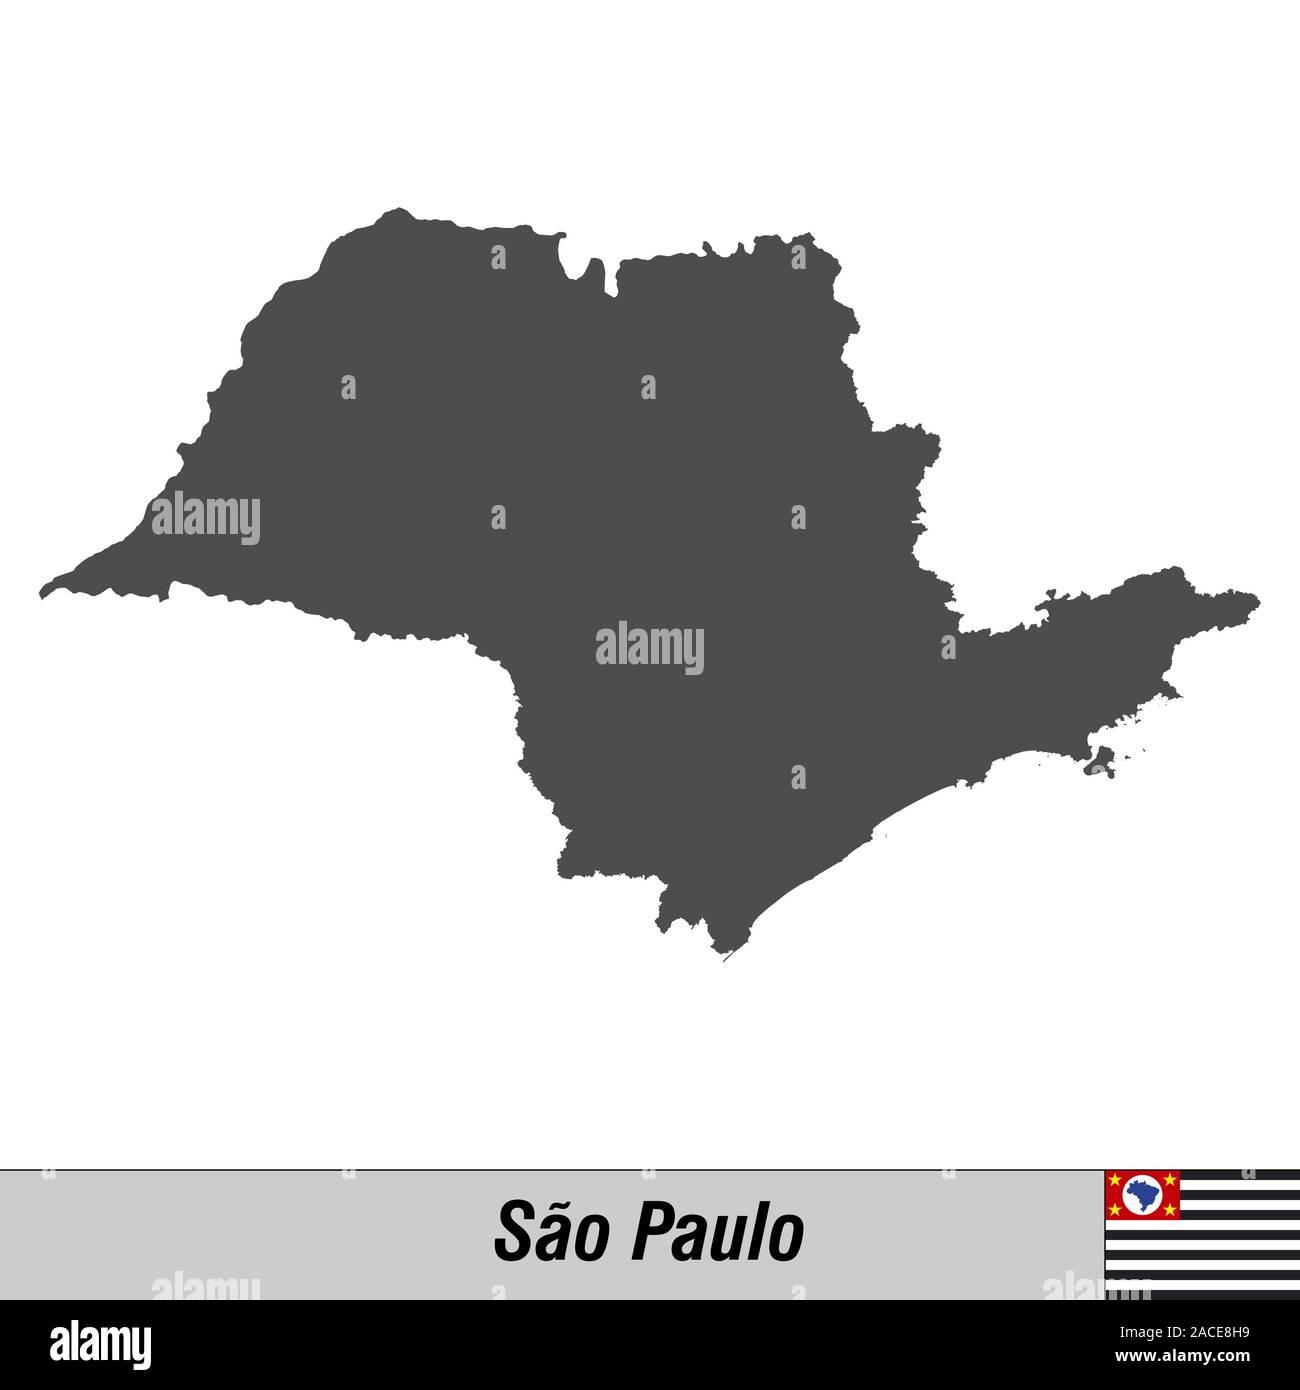 Sao Paulo Outline Stock Photos Sao Paulo Outline Stock Images